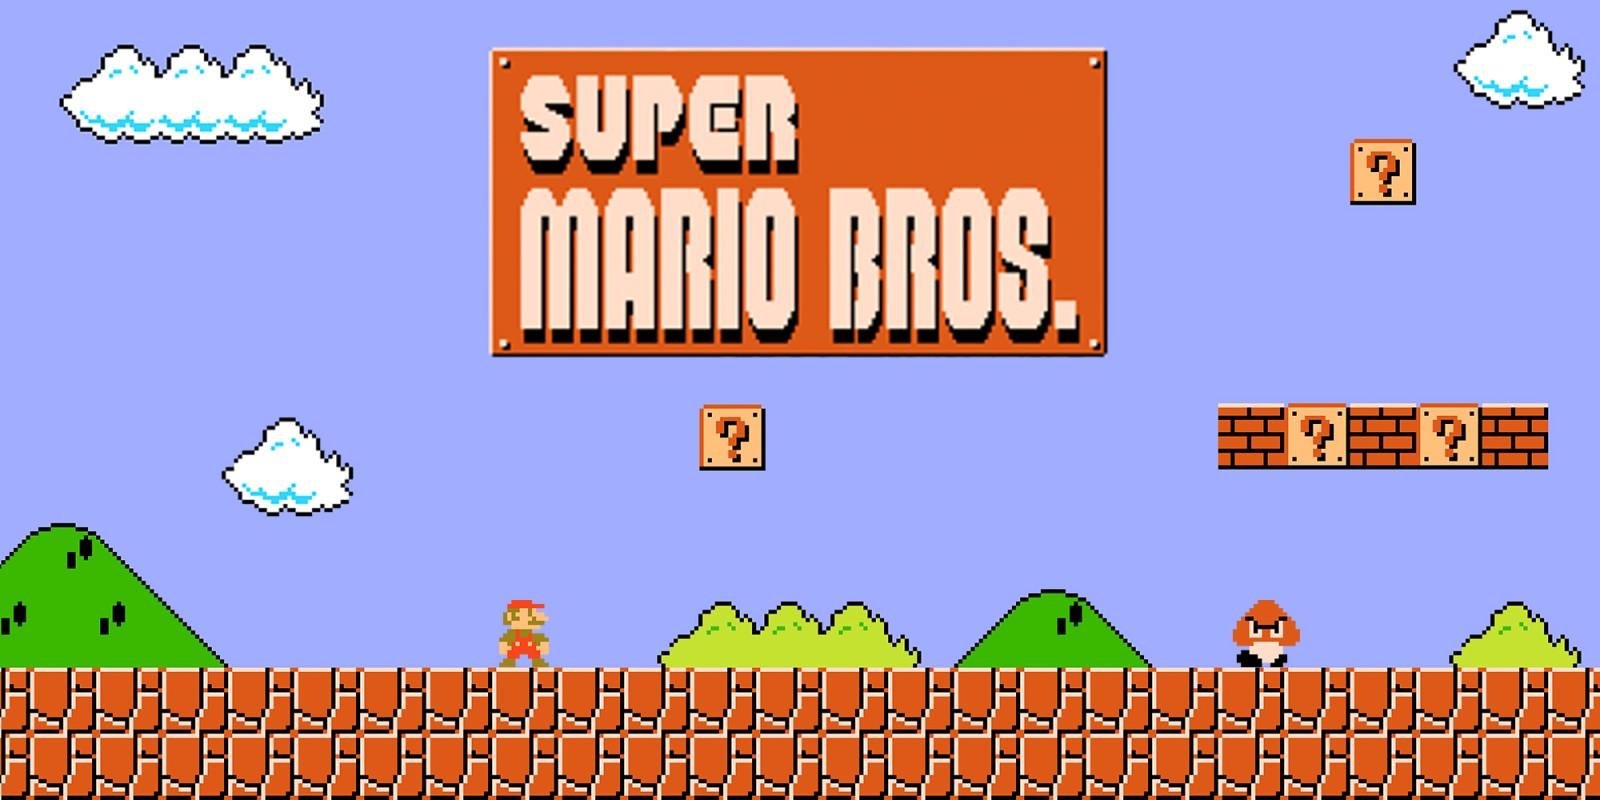 Retro Gamers, Super Nintendo, Nintendo, Atari, Super Mario, Internacional Superstar Soccer Deluxe, Donkey kong